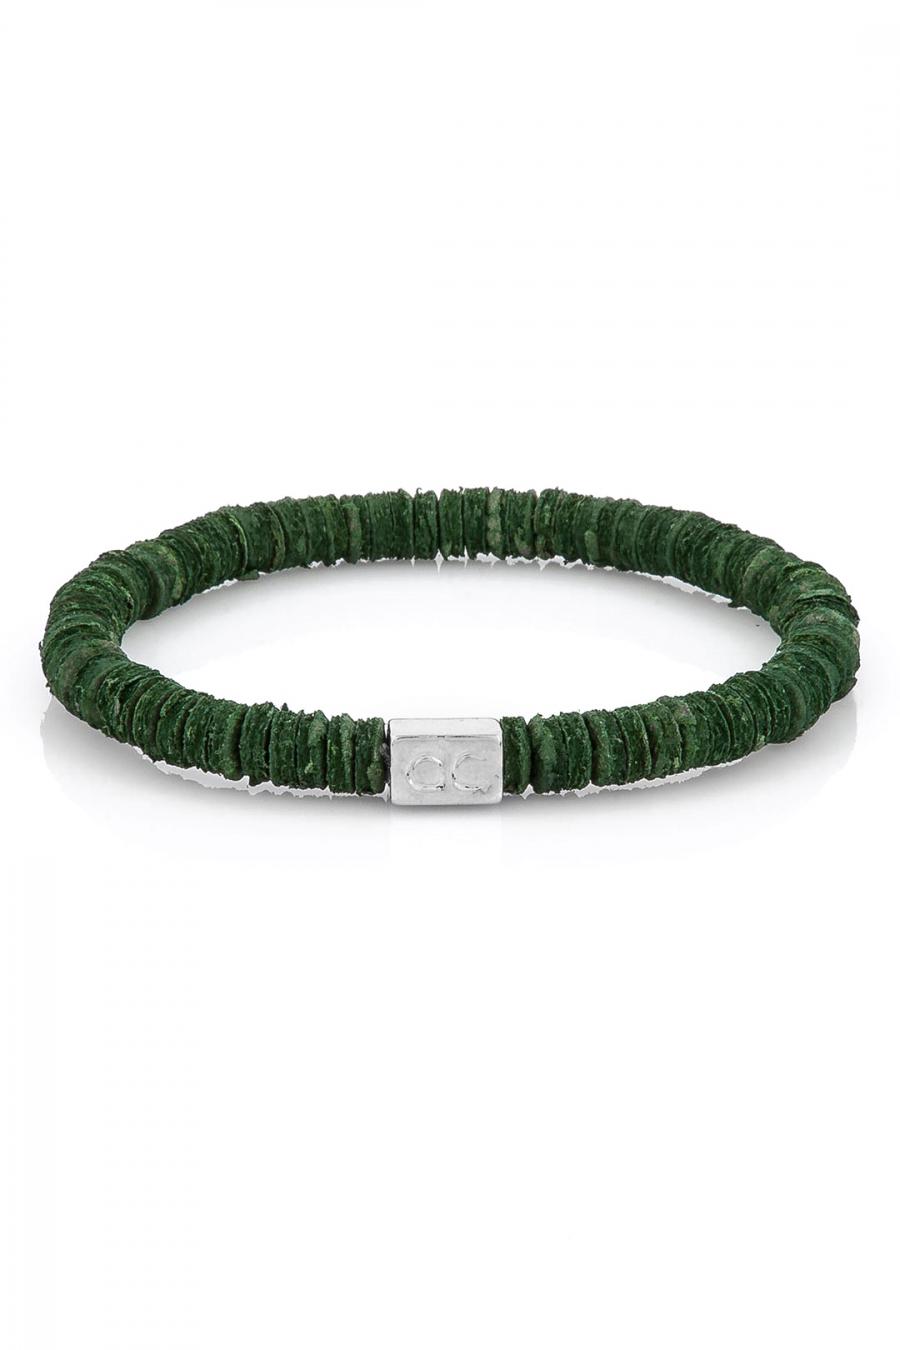 Leather Pieces Green Bileklik